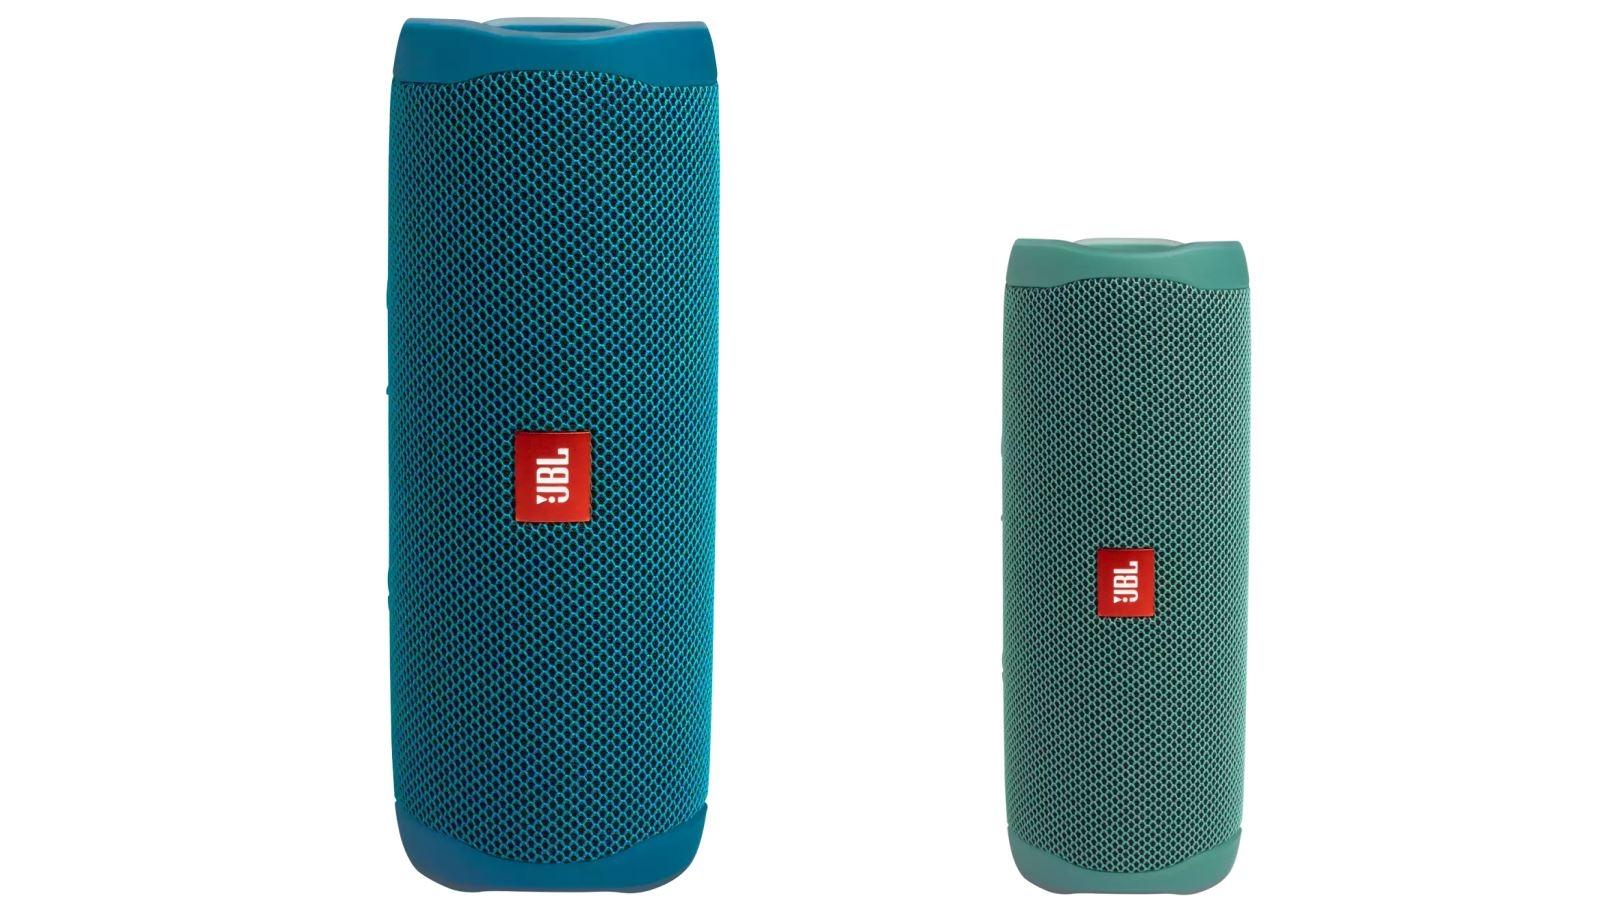 Image of JBL Flip 5 Eco Edition Portable Speaker